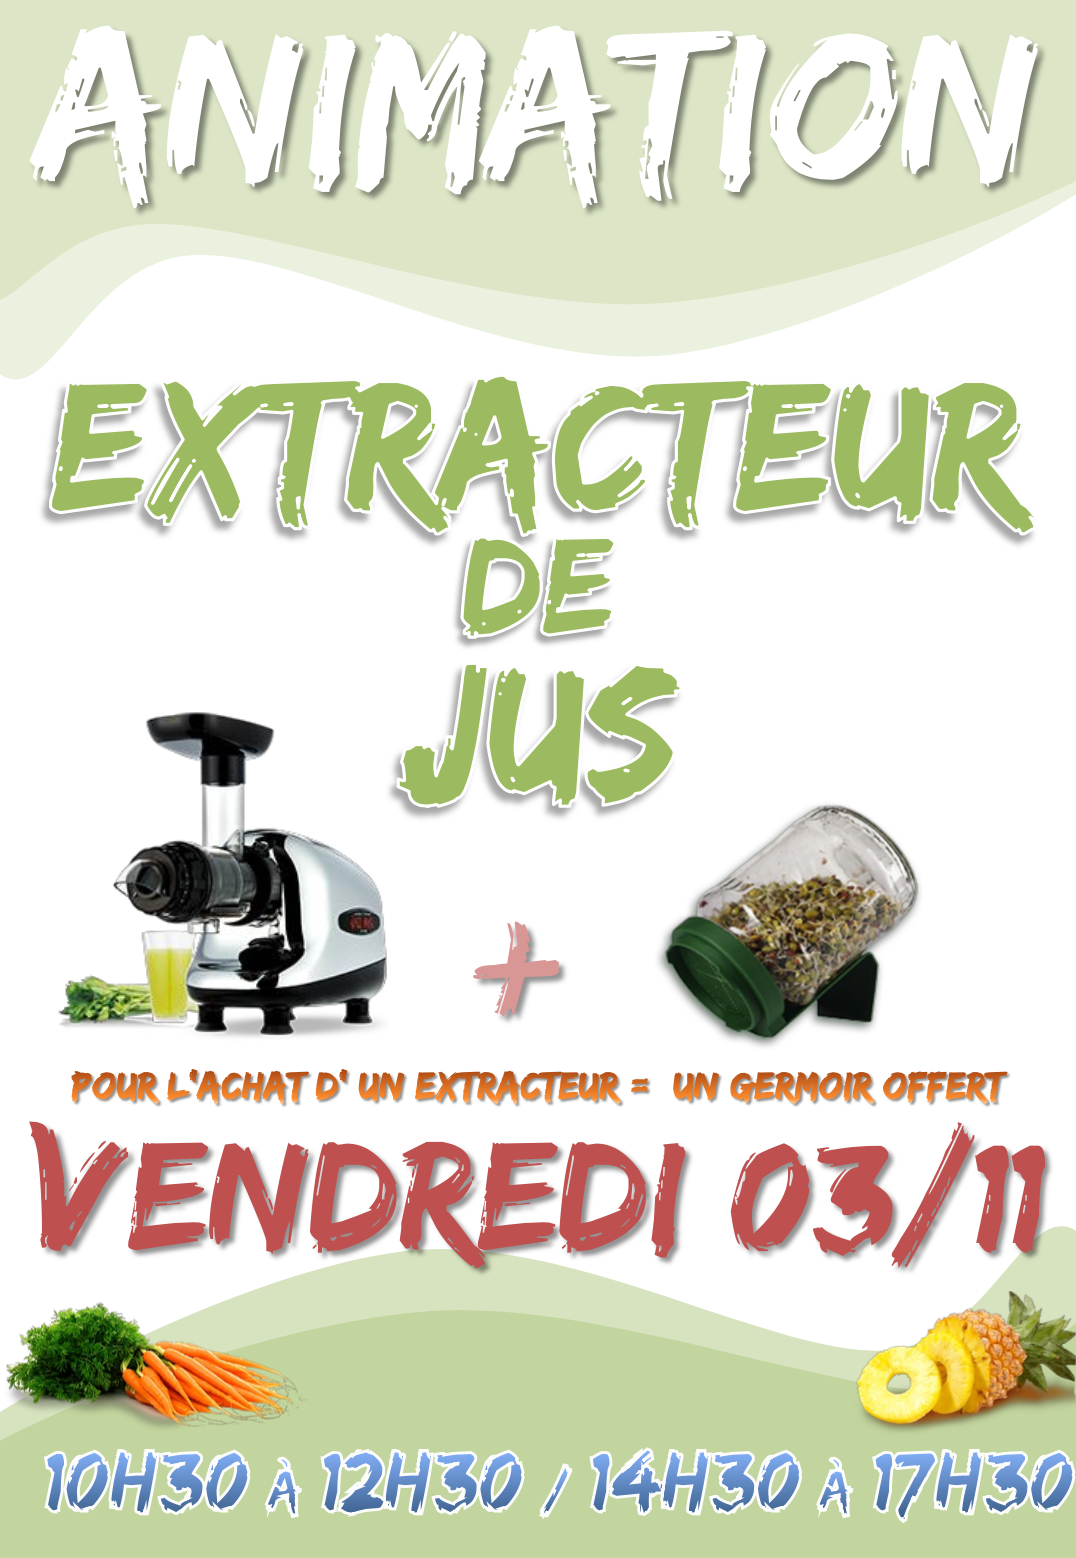 Animation extracteur de jus vendredi 3 novembre tr lissac - Comparatif extracteur de jus 2017 ...